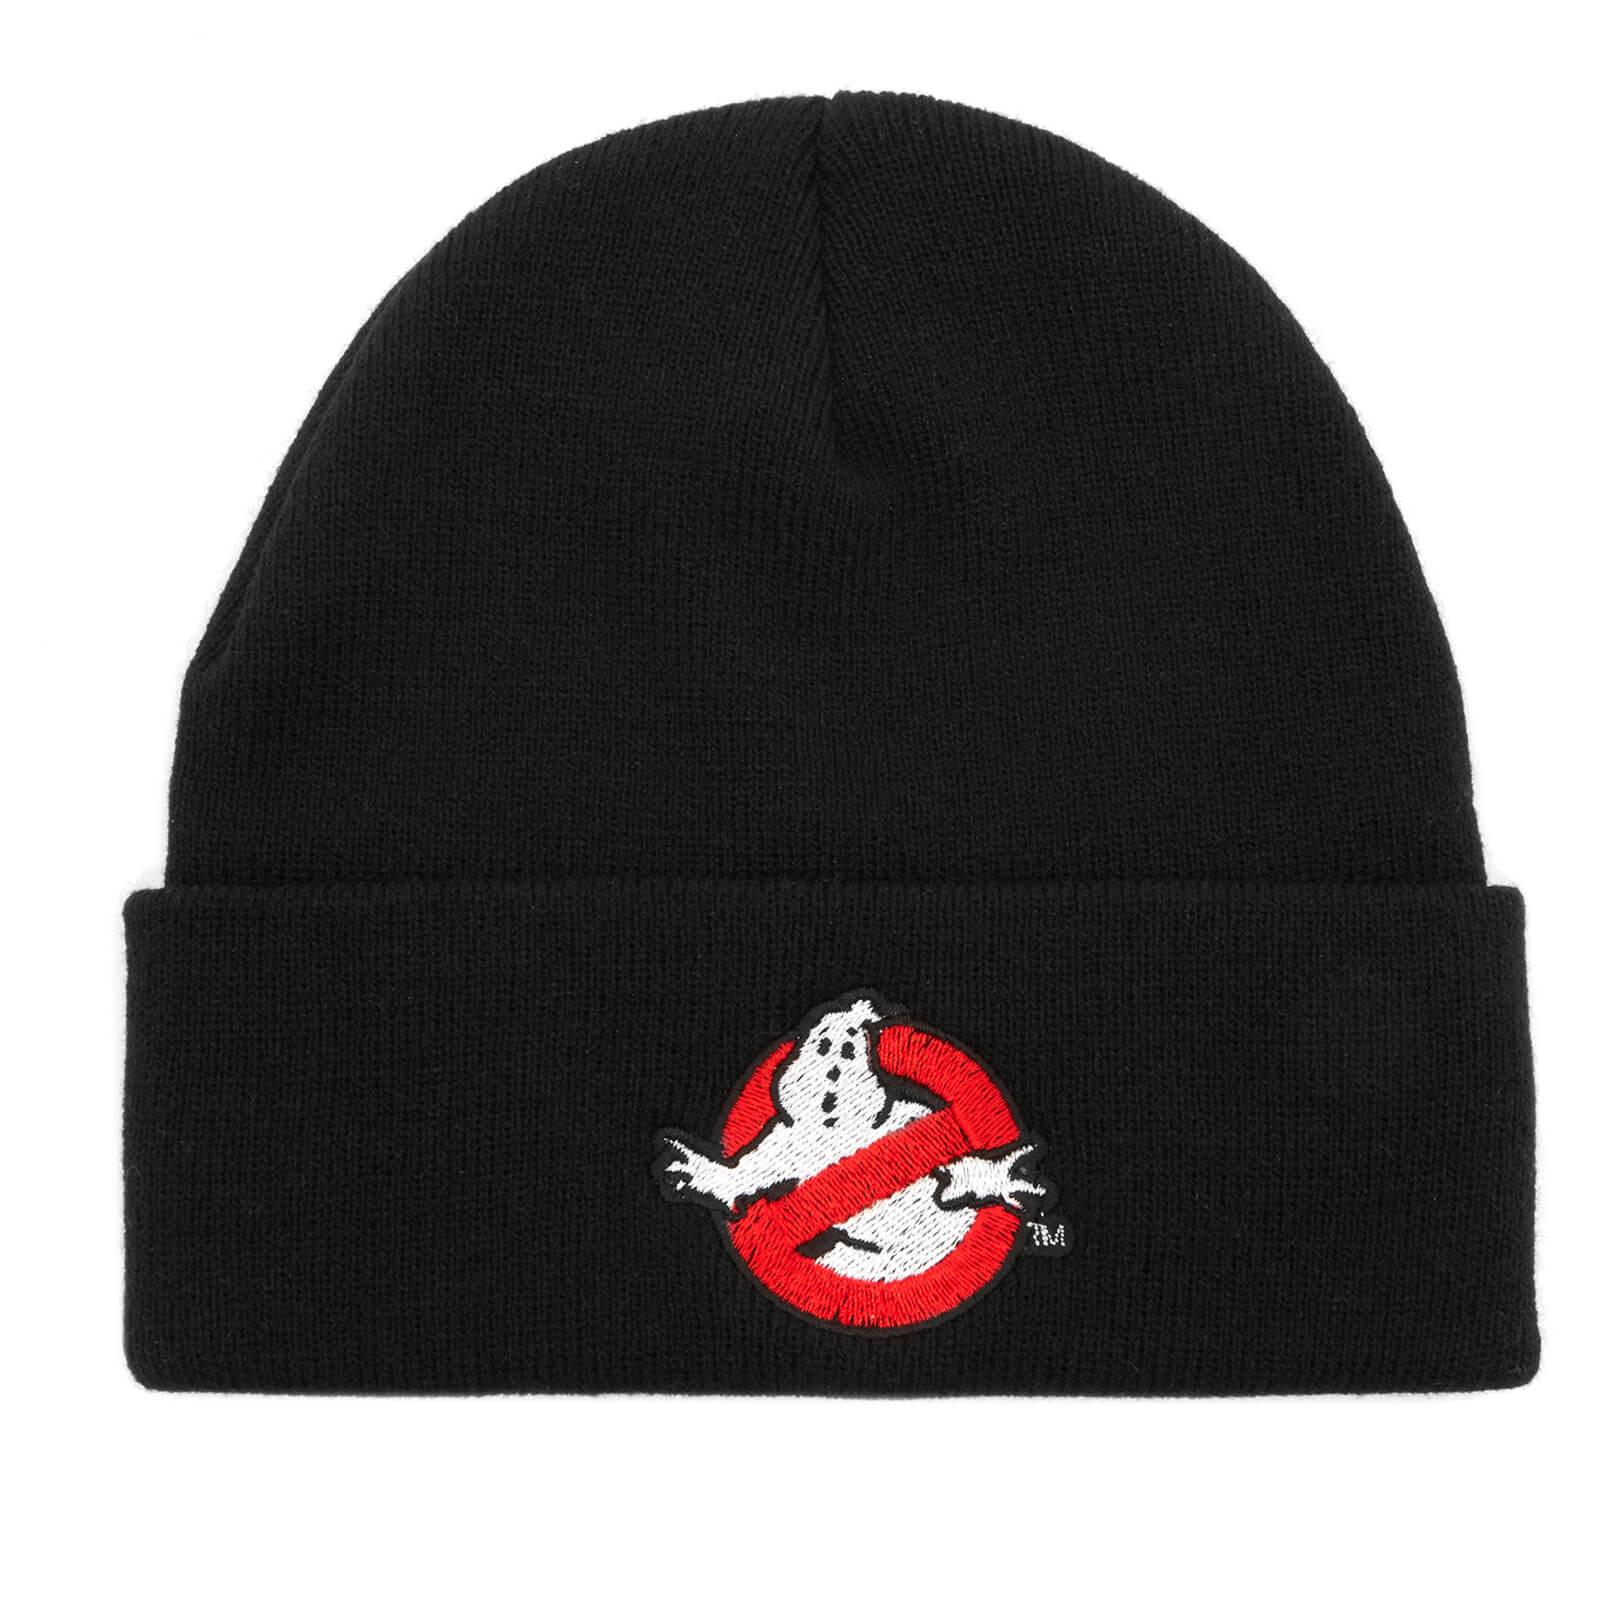 Ghostbusters Logo Beanie - Black